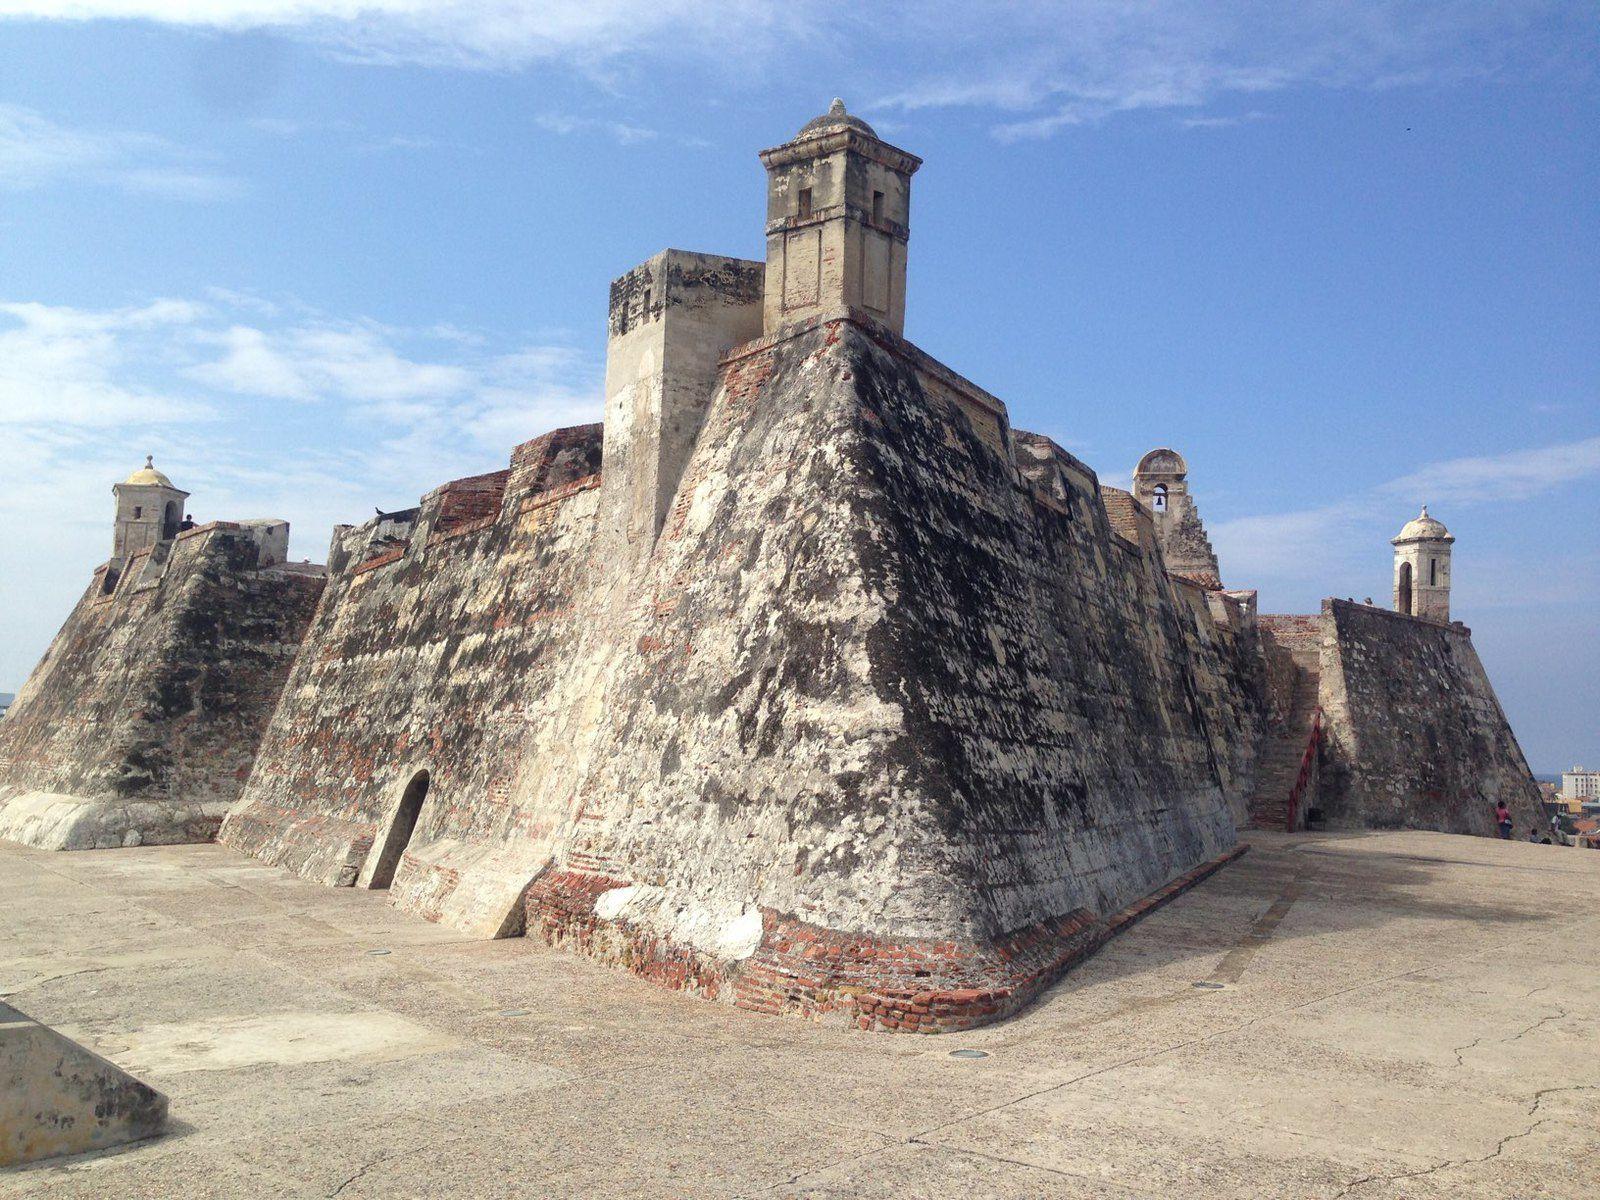 Le fort San Filipe de Barajaes XVI siècle.